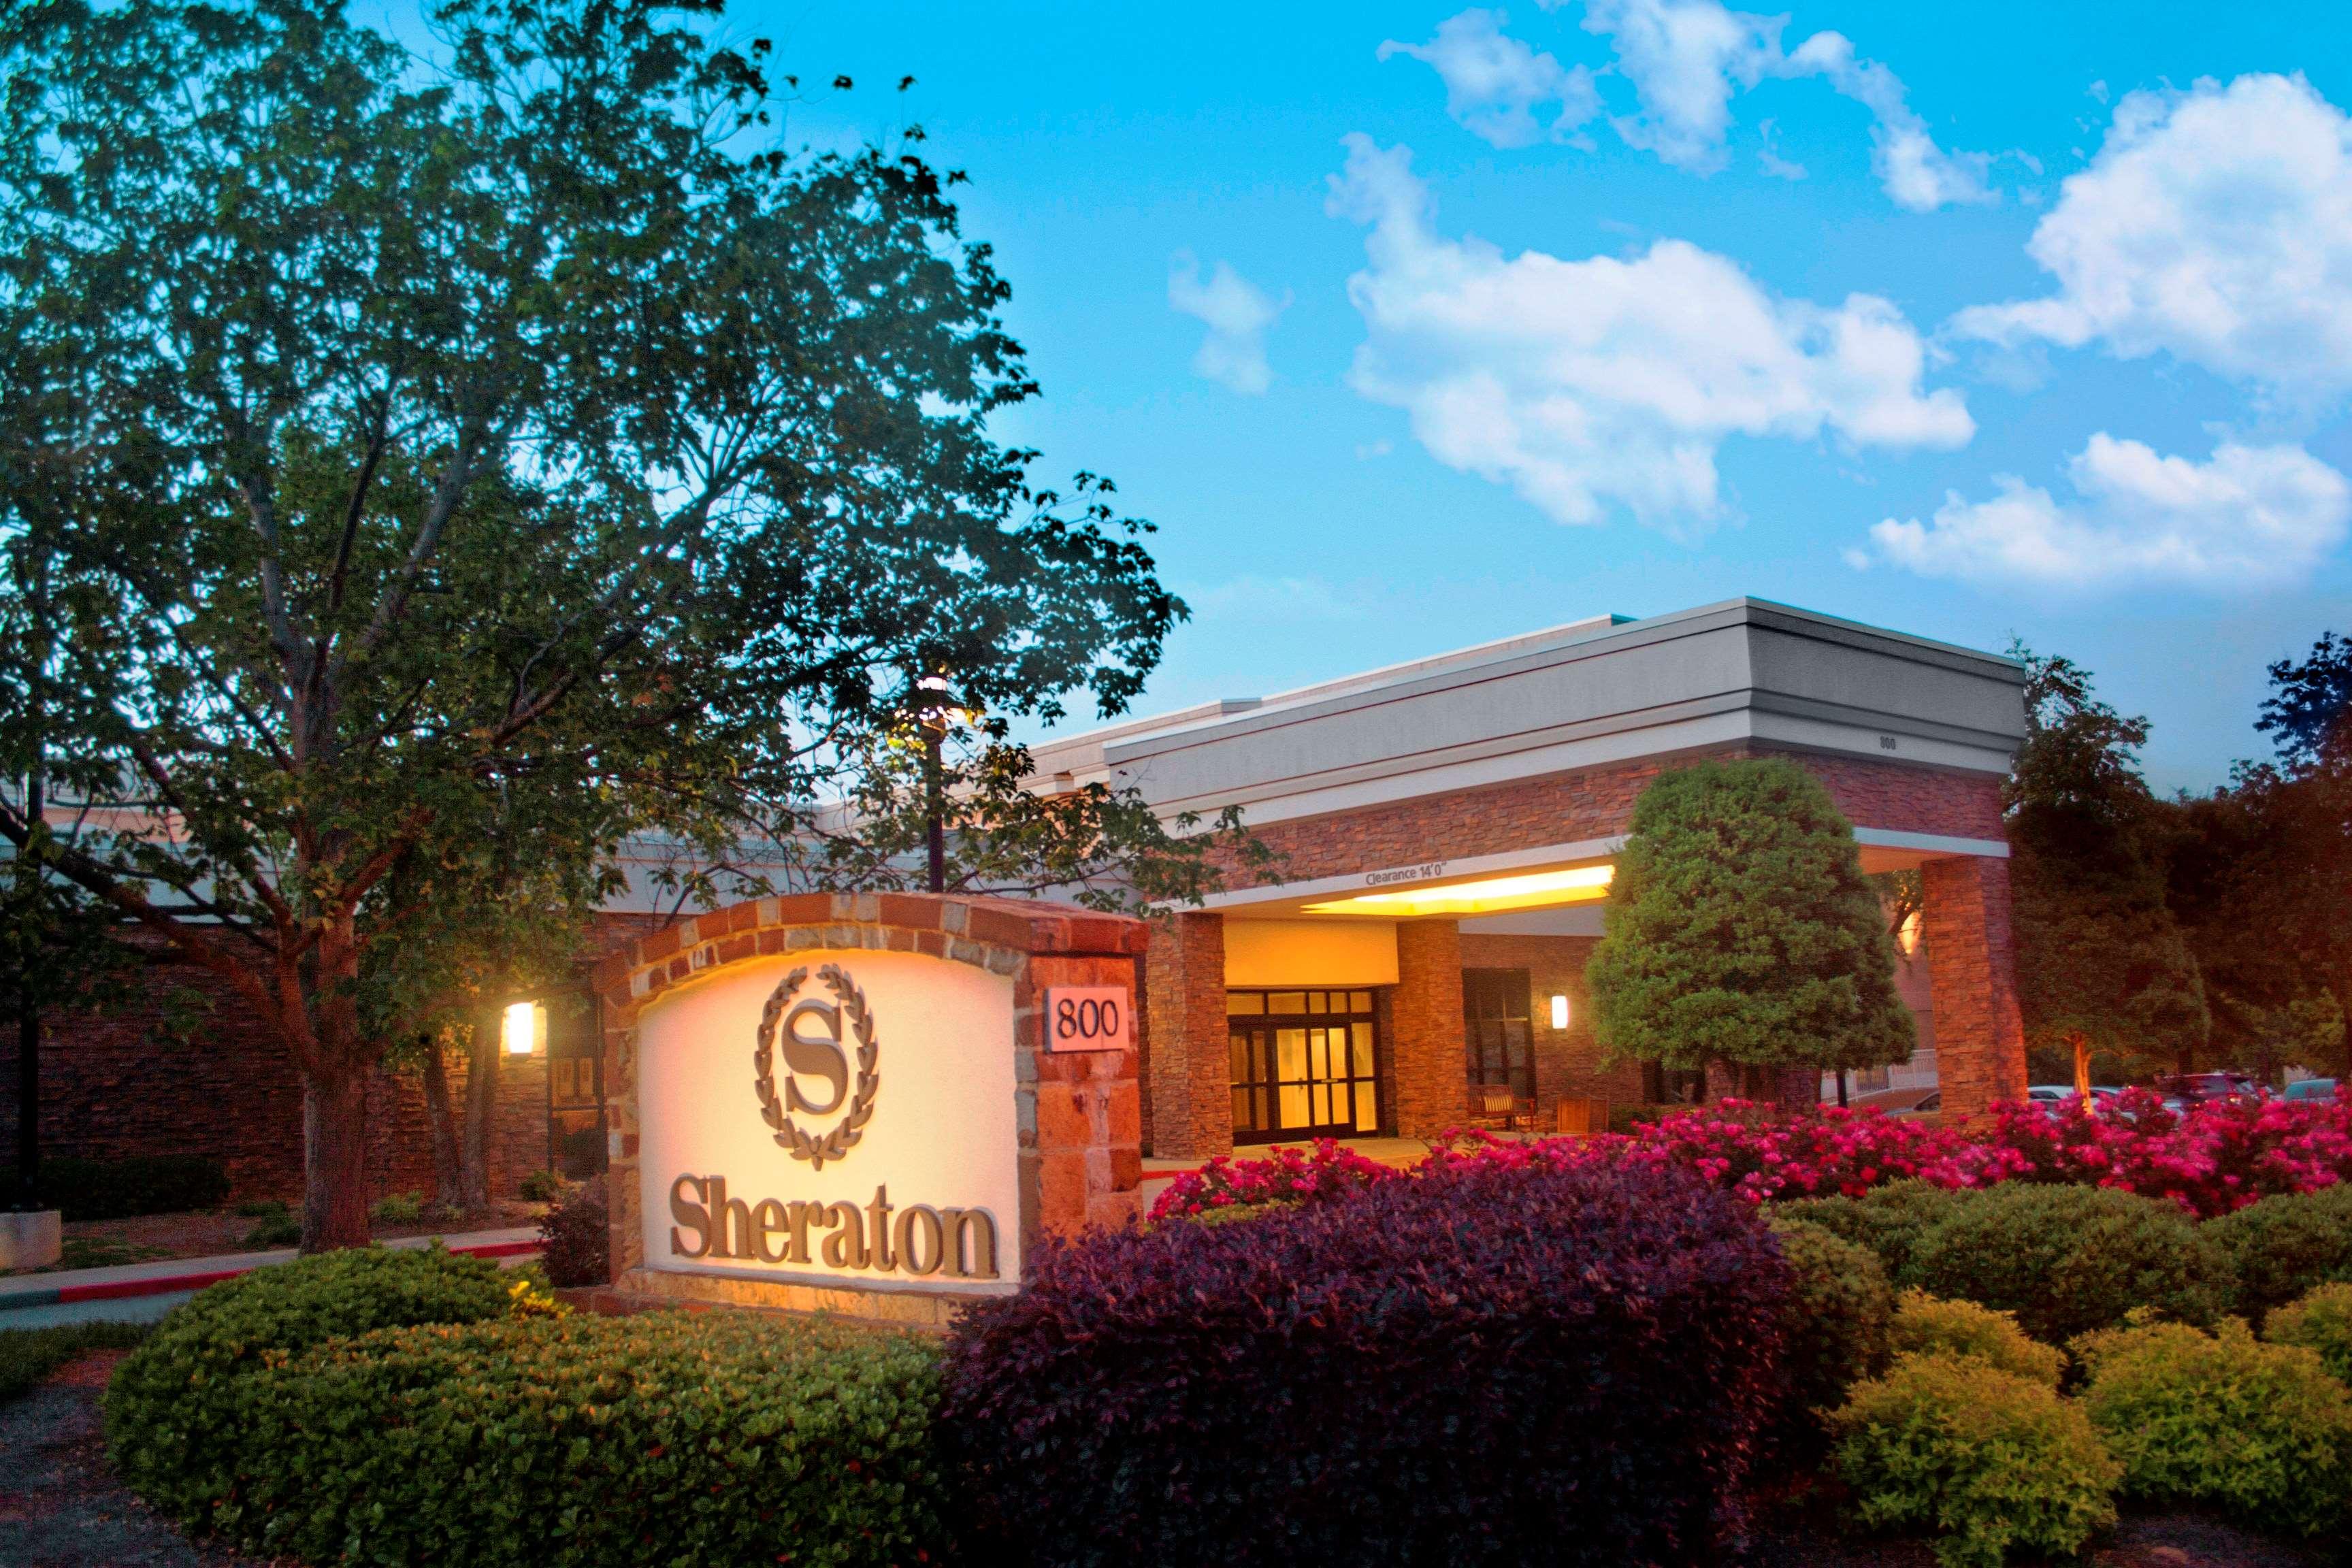 Sheraton hotel discount coupon